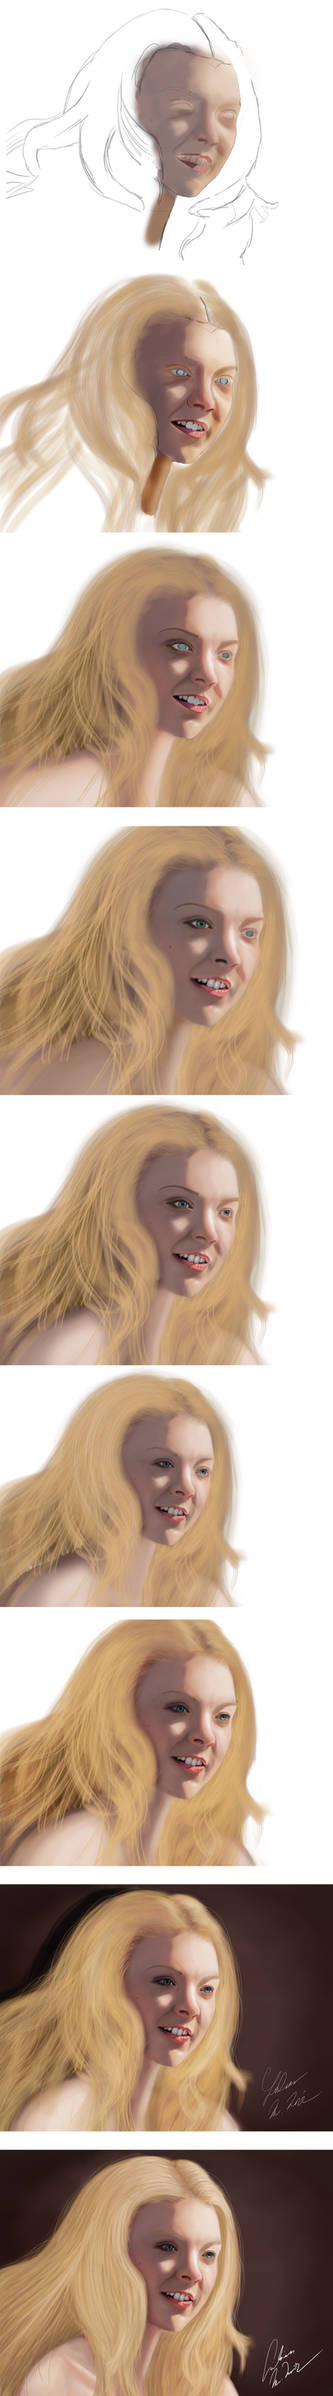 Lucent Beauty of Natalie Dormer Progress